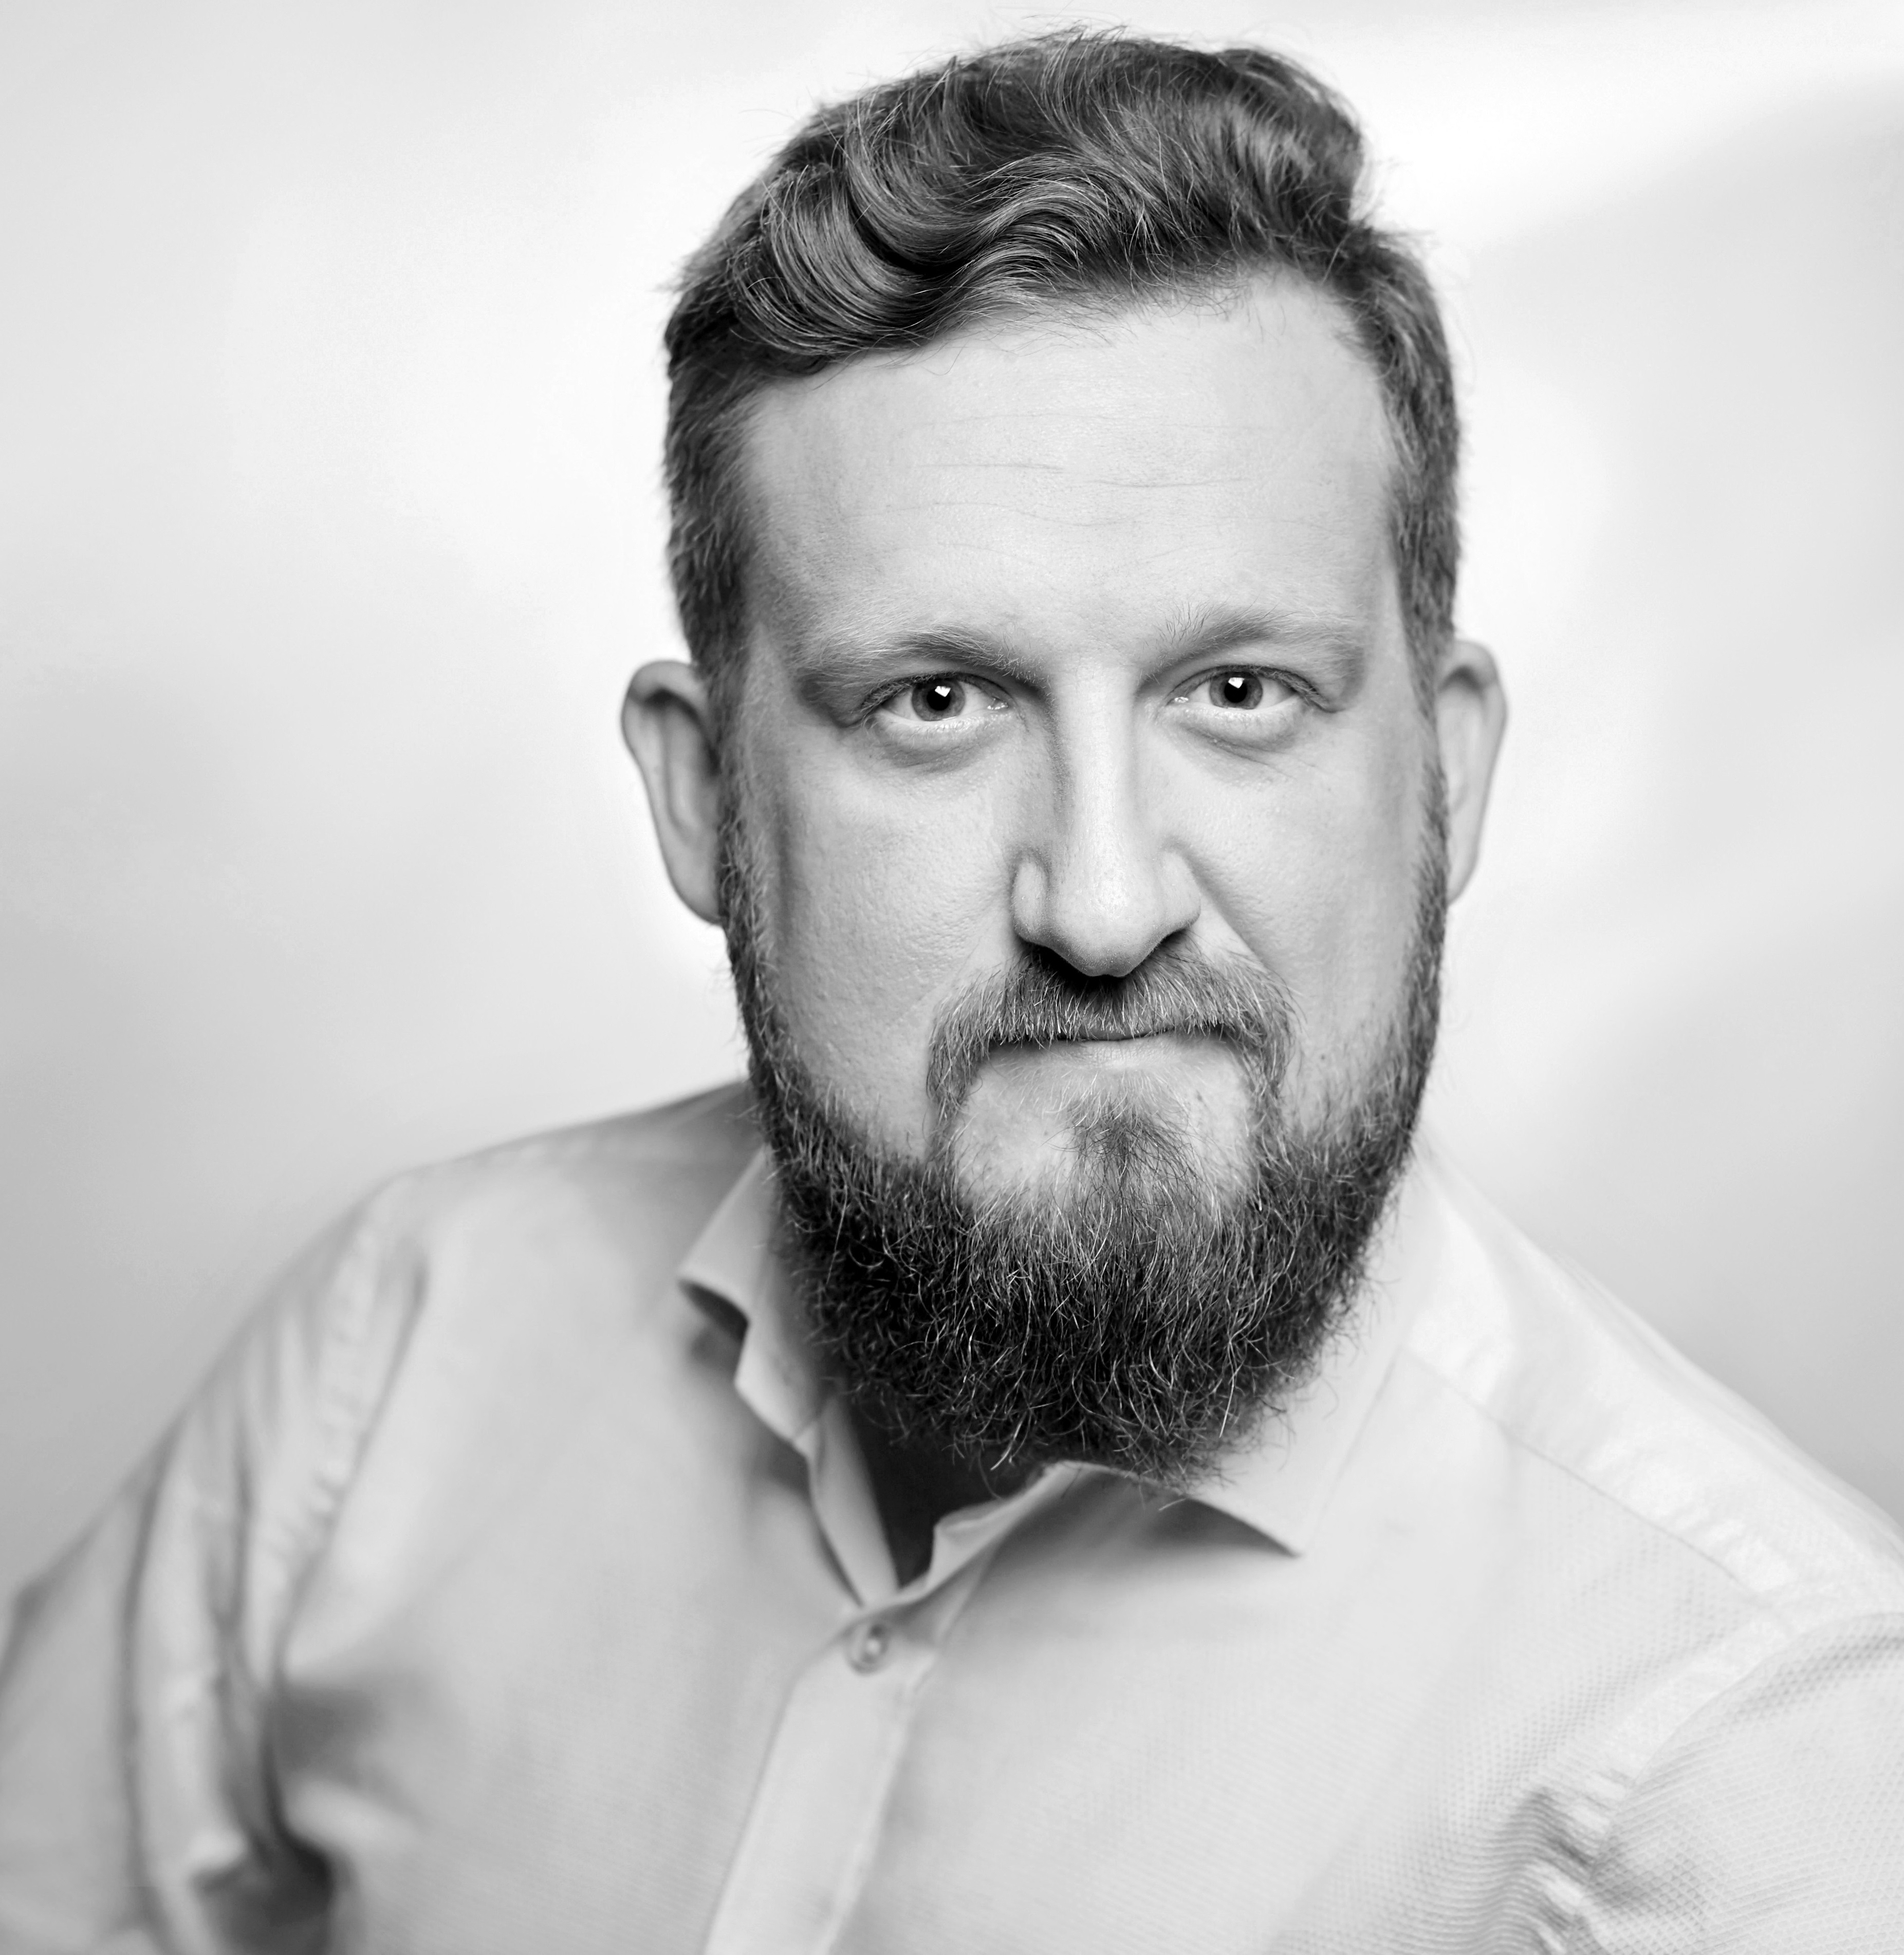 Wojciech Gwiazda